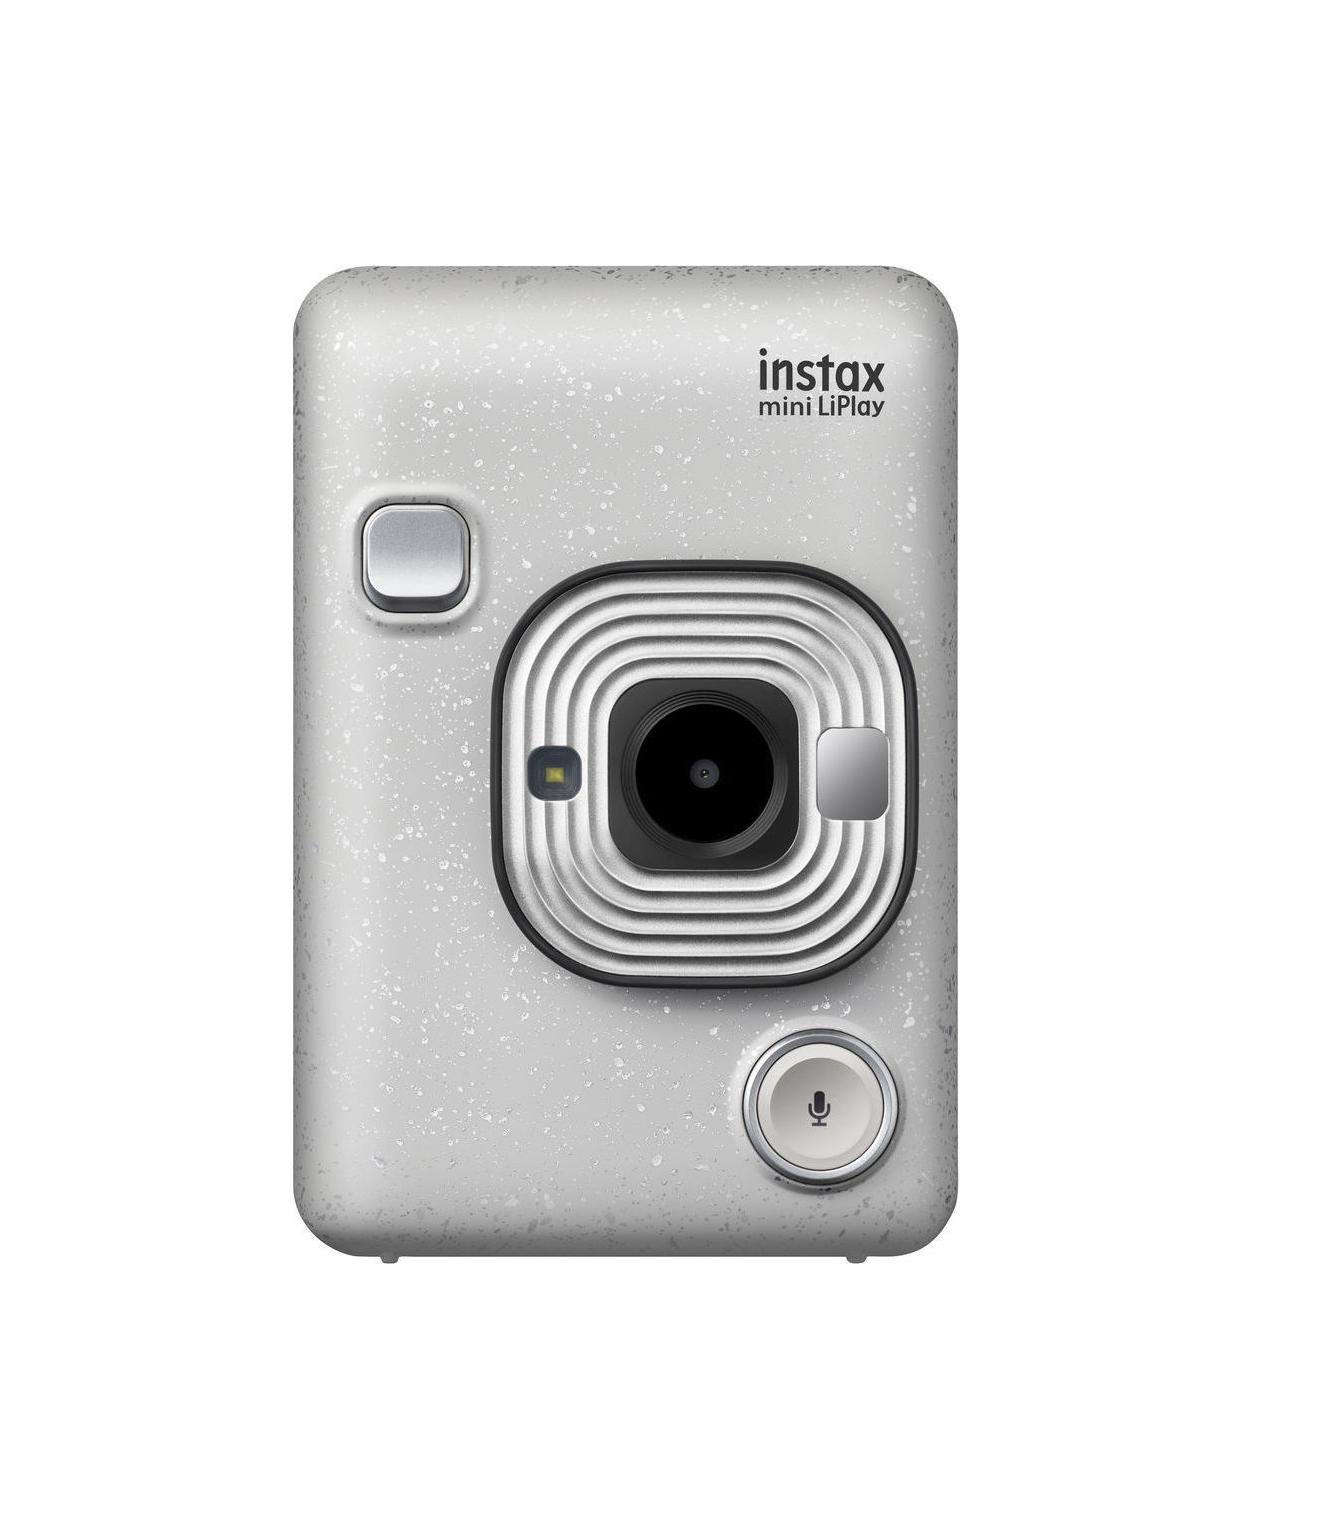 Fujifilm Instax Mini LiPlay Stone White Αναλογική Φωτογραφική Μηχανή 16631758